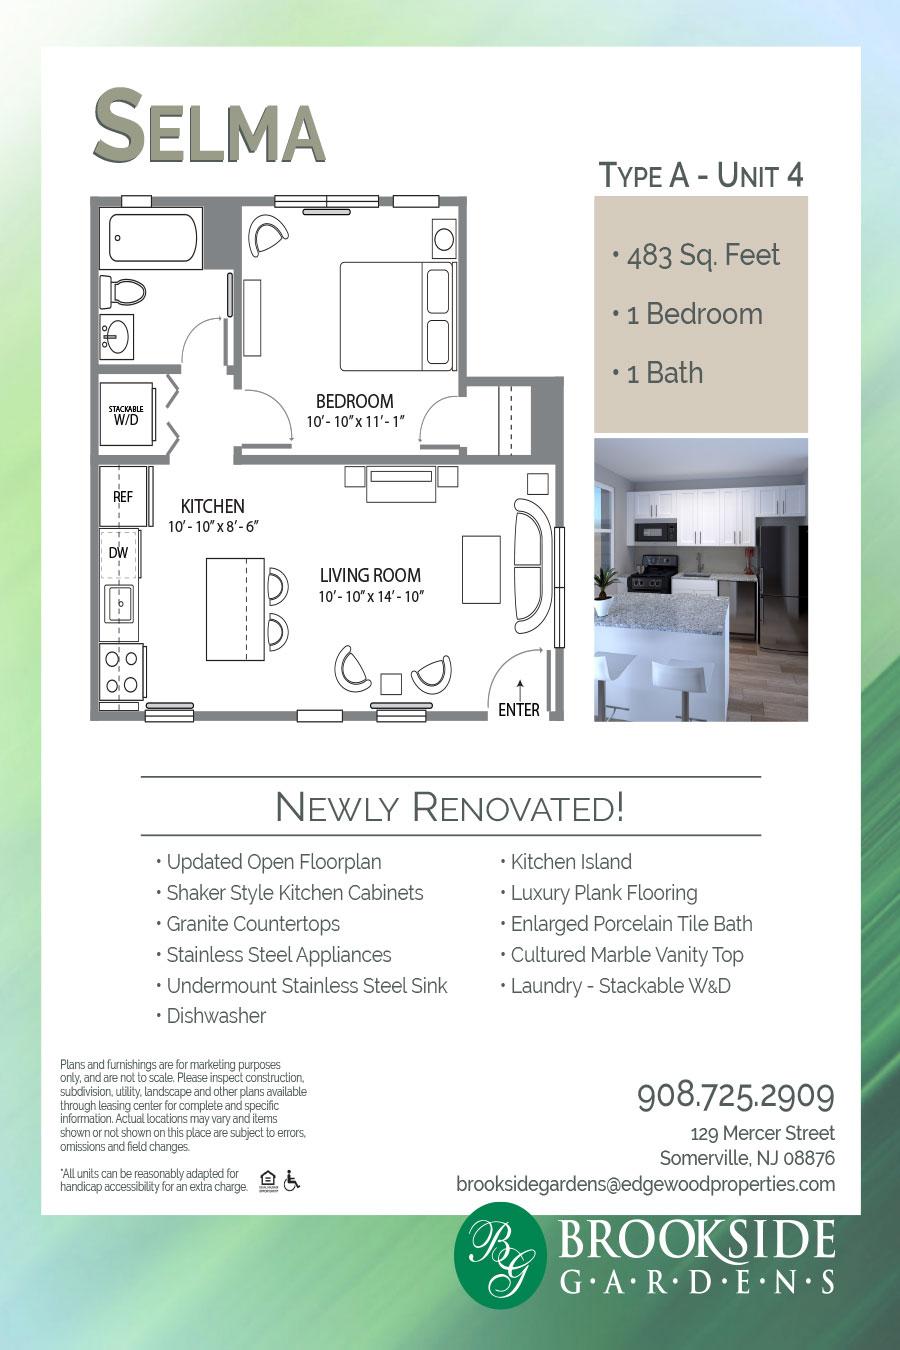 Brookside Gardens Apartment Floor Plan Selma Type A - Unit 4